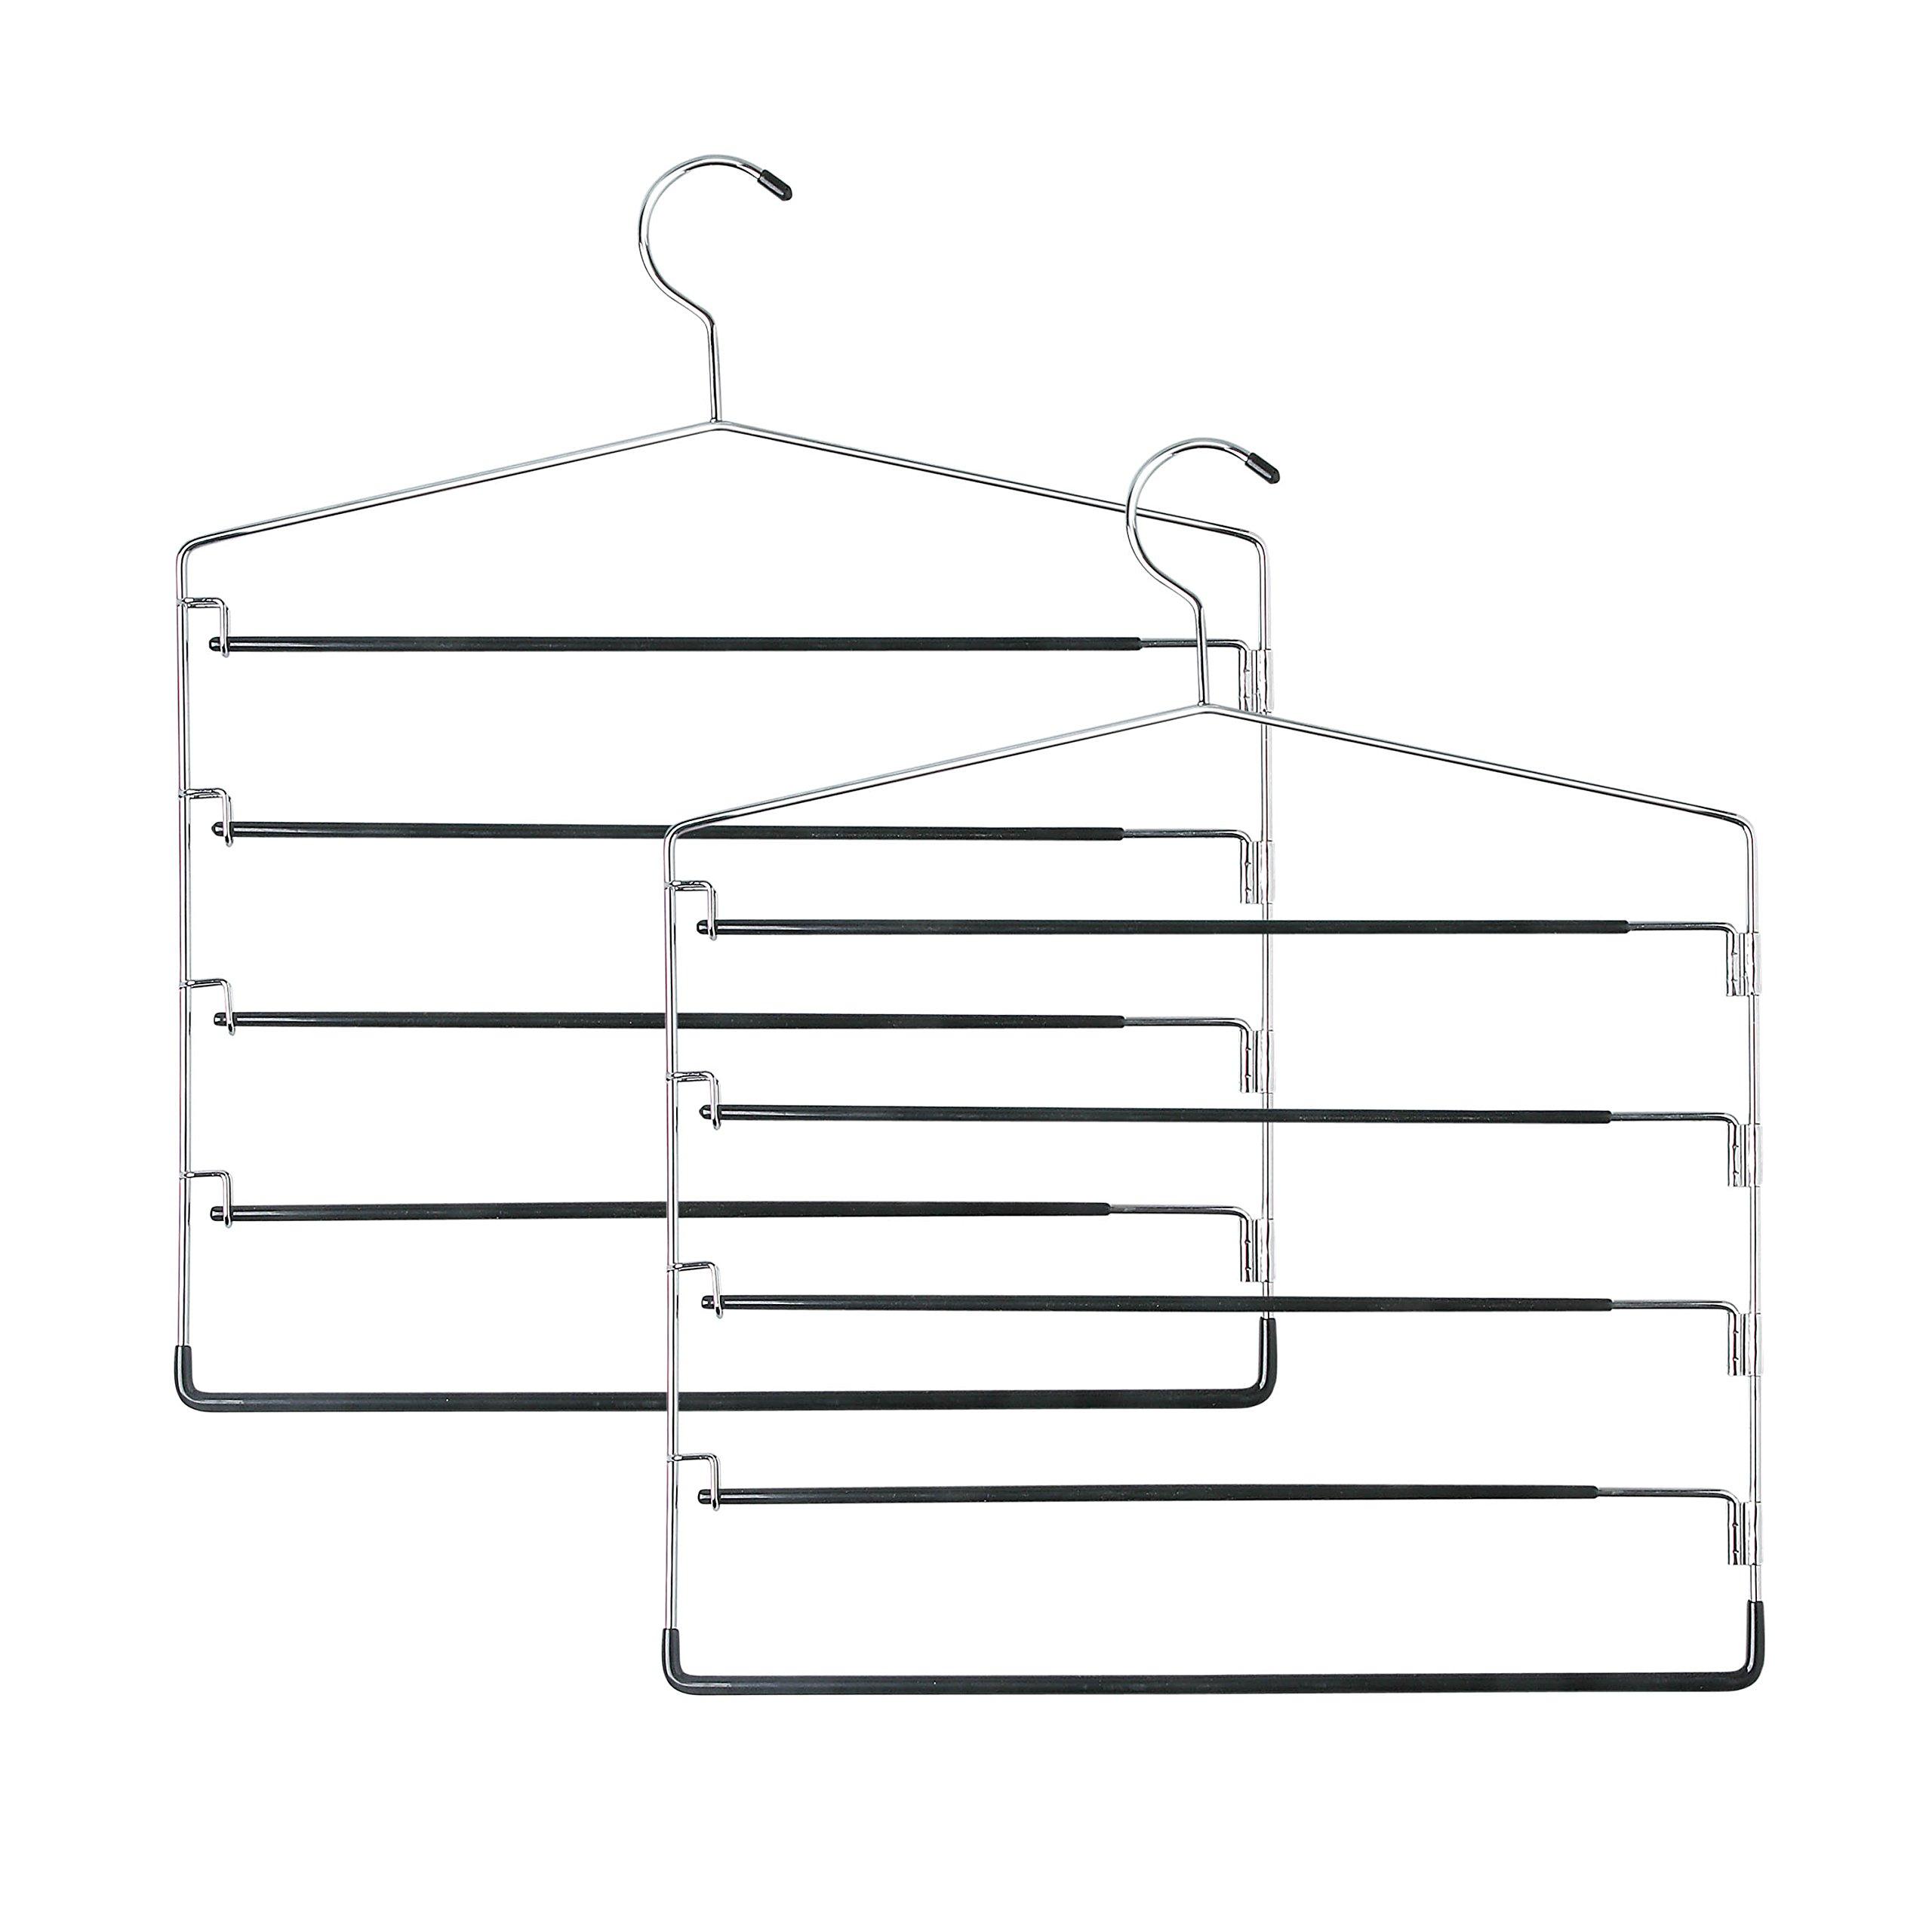 Honey-Can-Do HNGT01202 Five-Tier Swinging Arm Pant Rack Black, 2-Pack